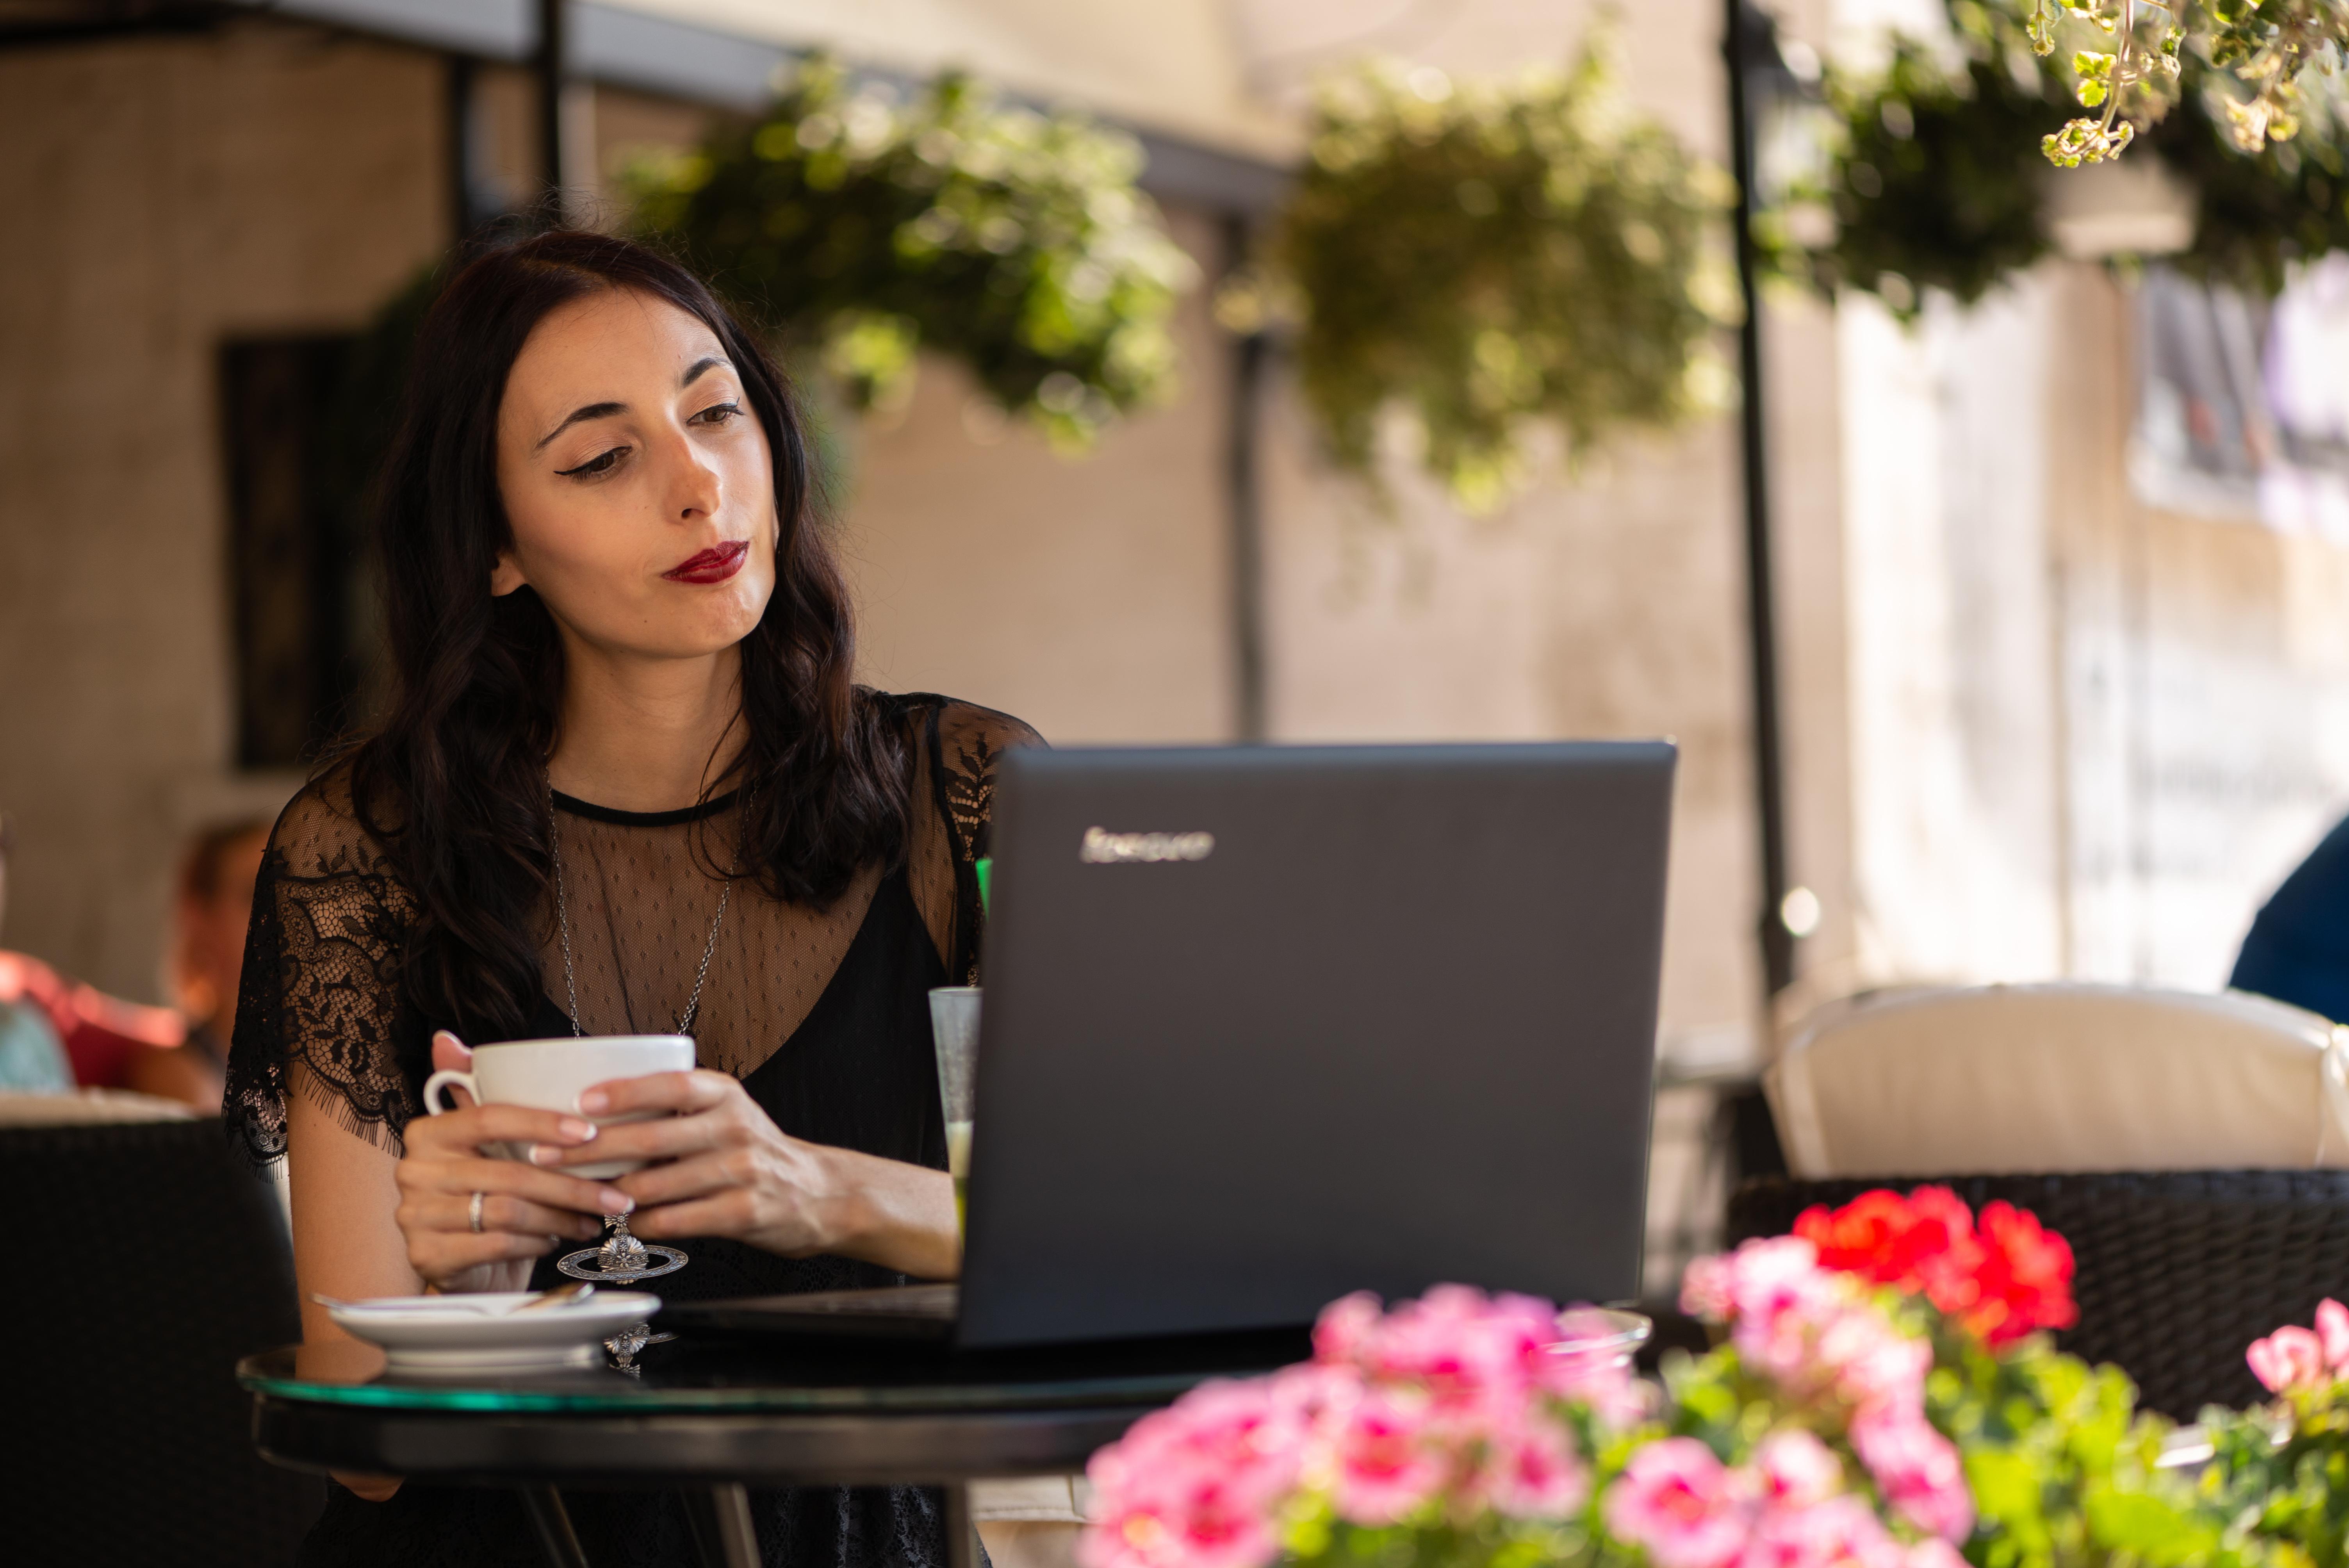 Allegra Caro is a blogger